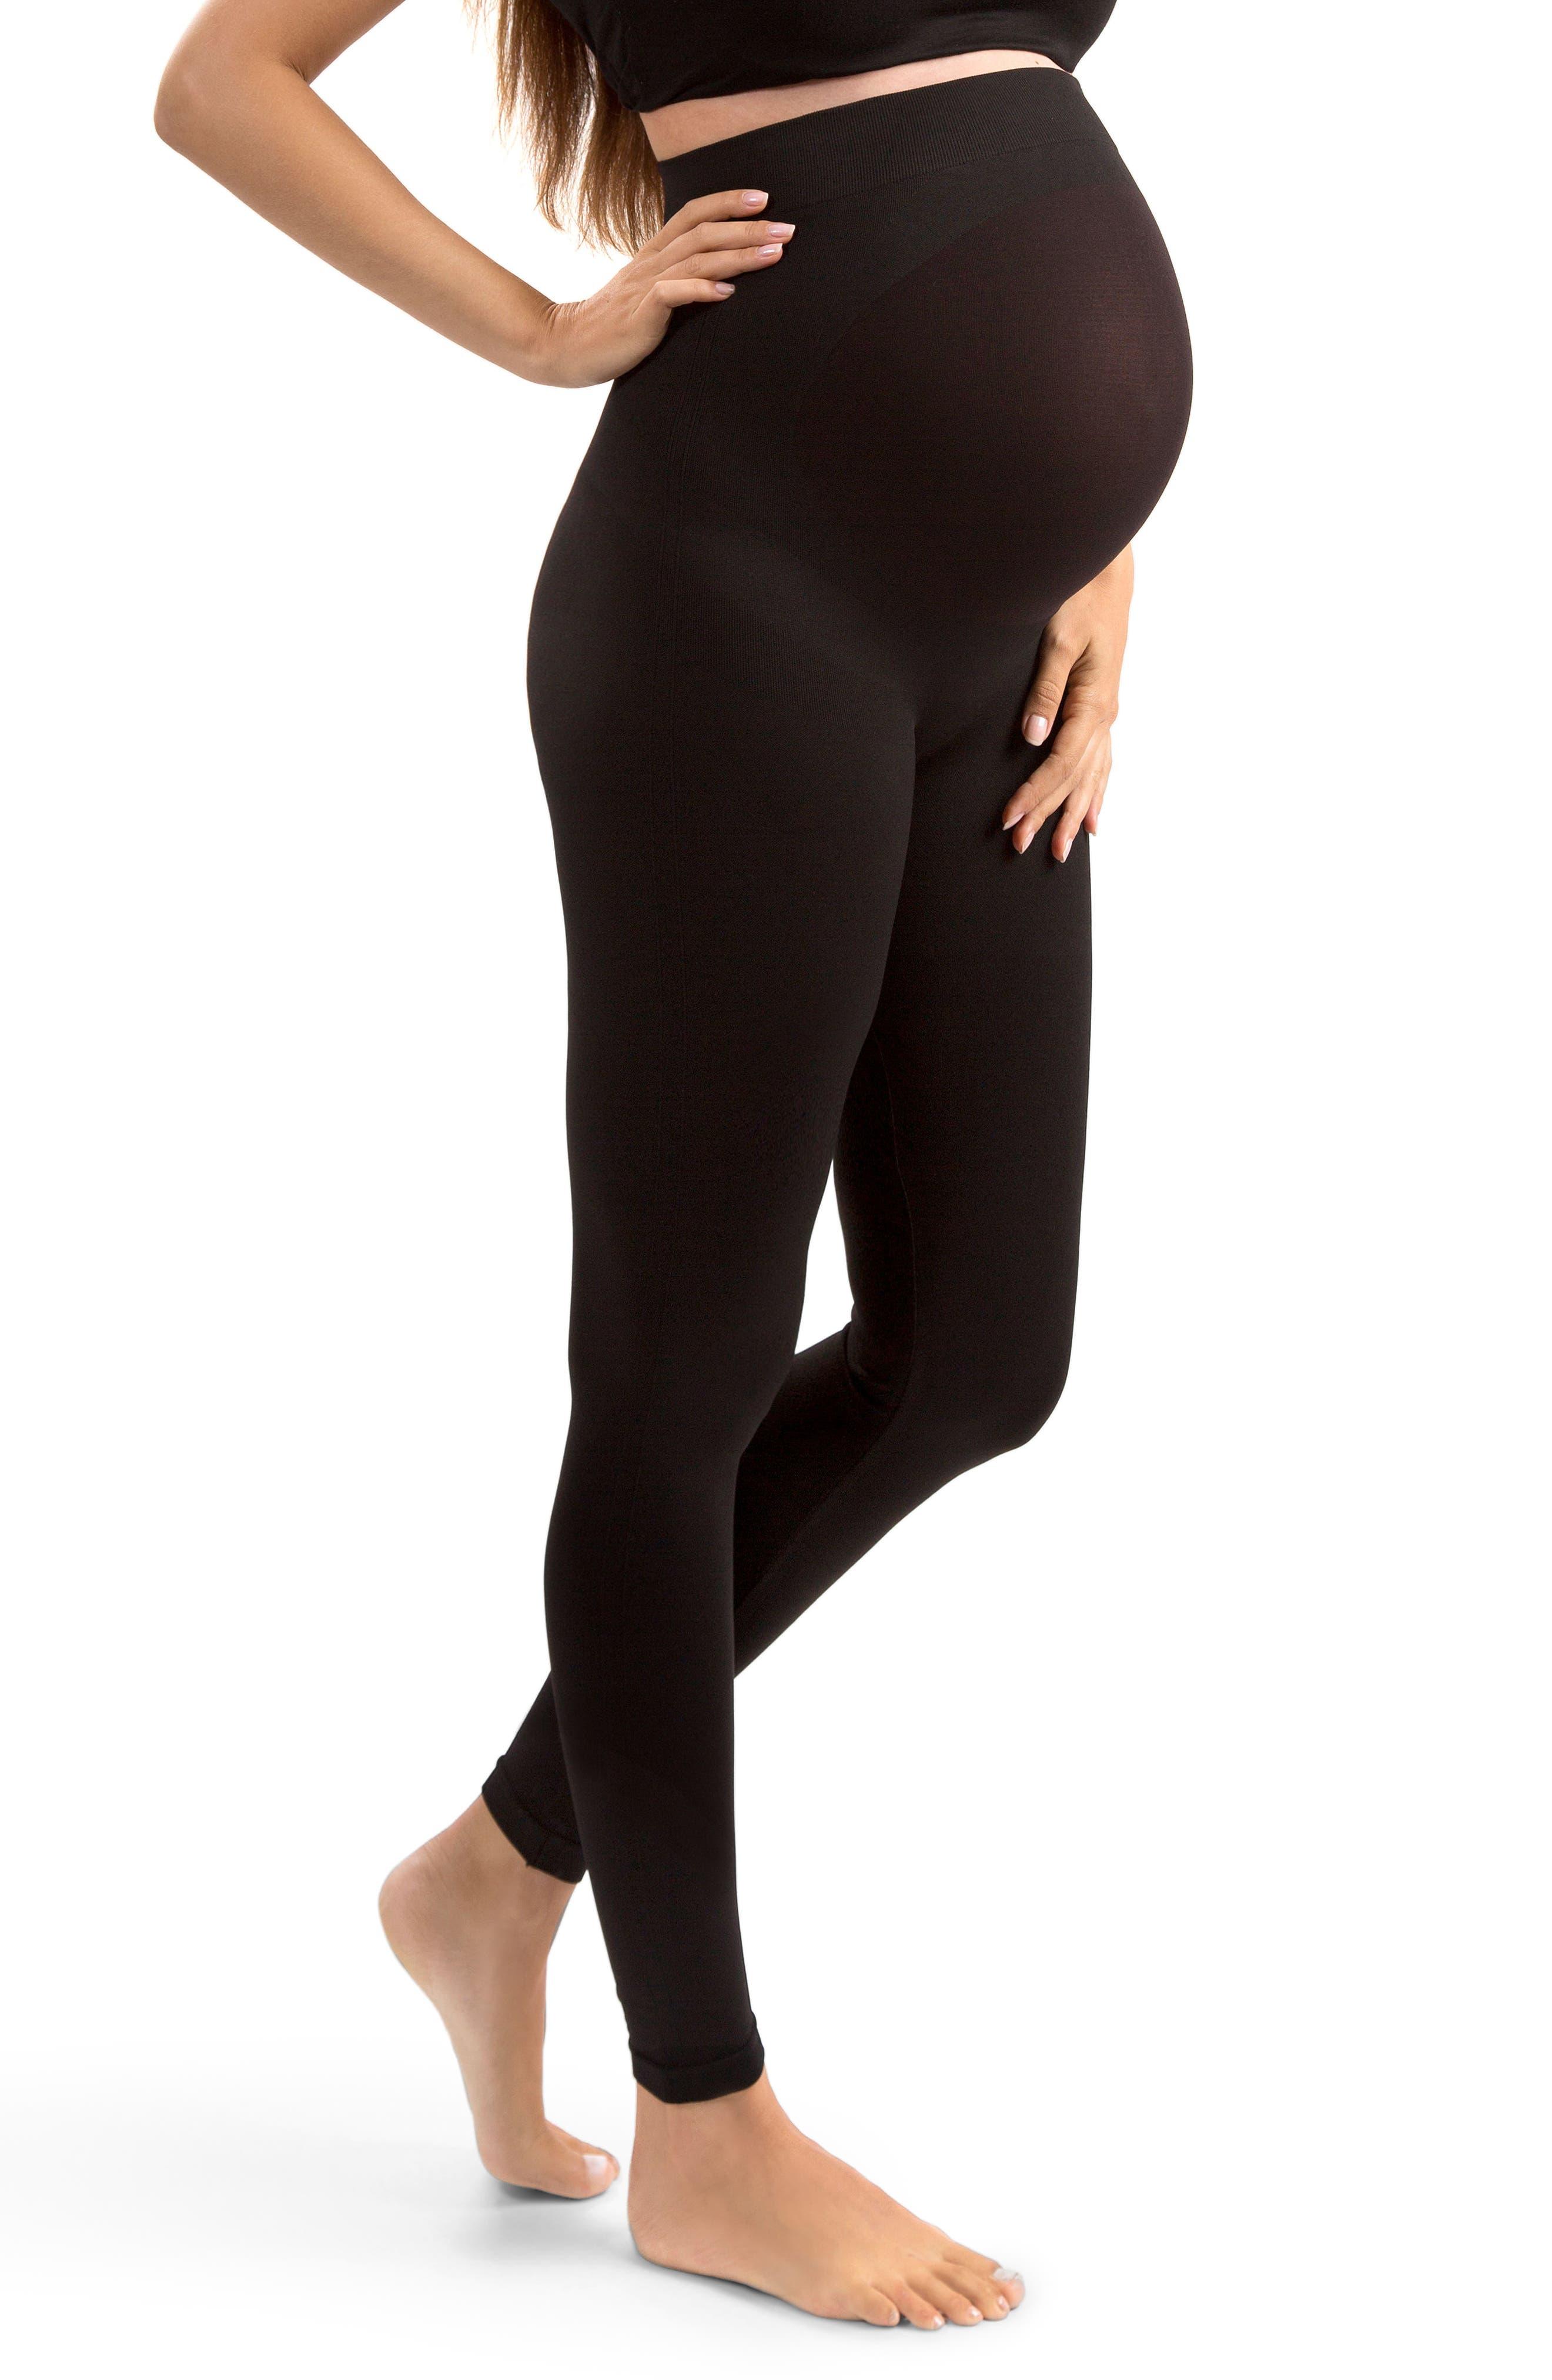 Sexy Maternity Leggings